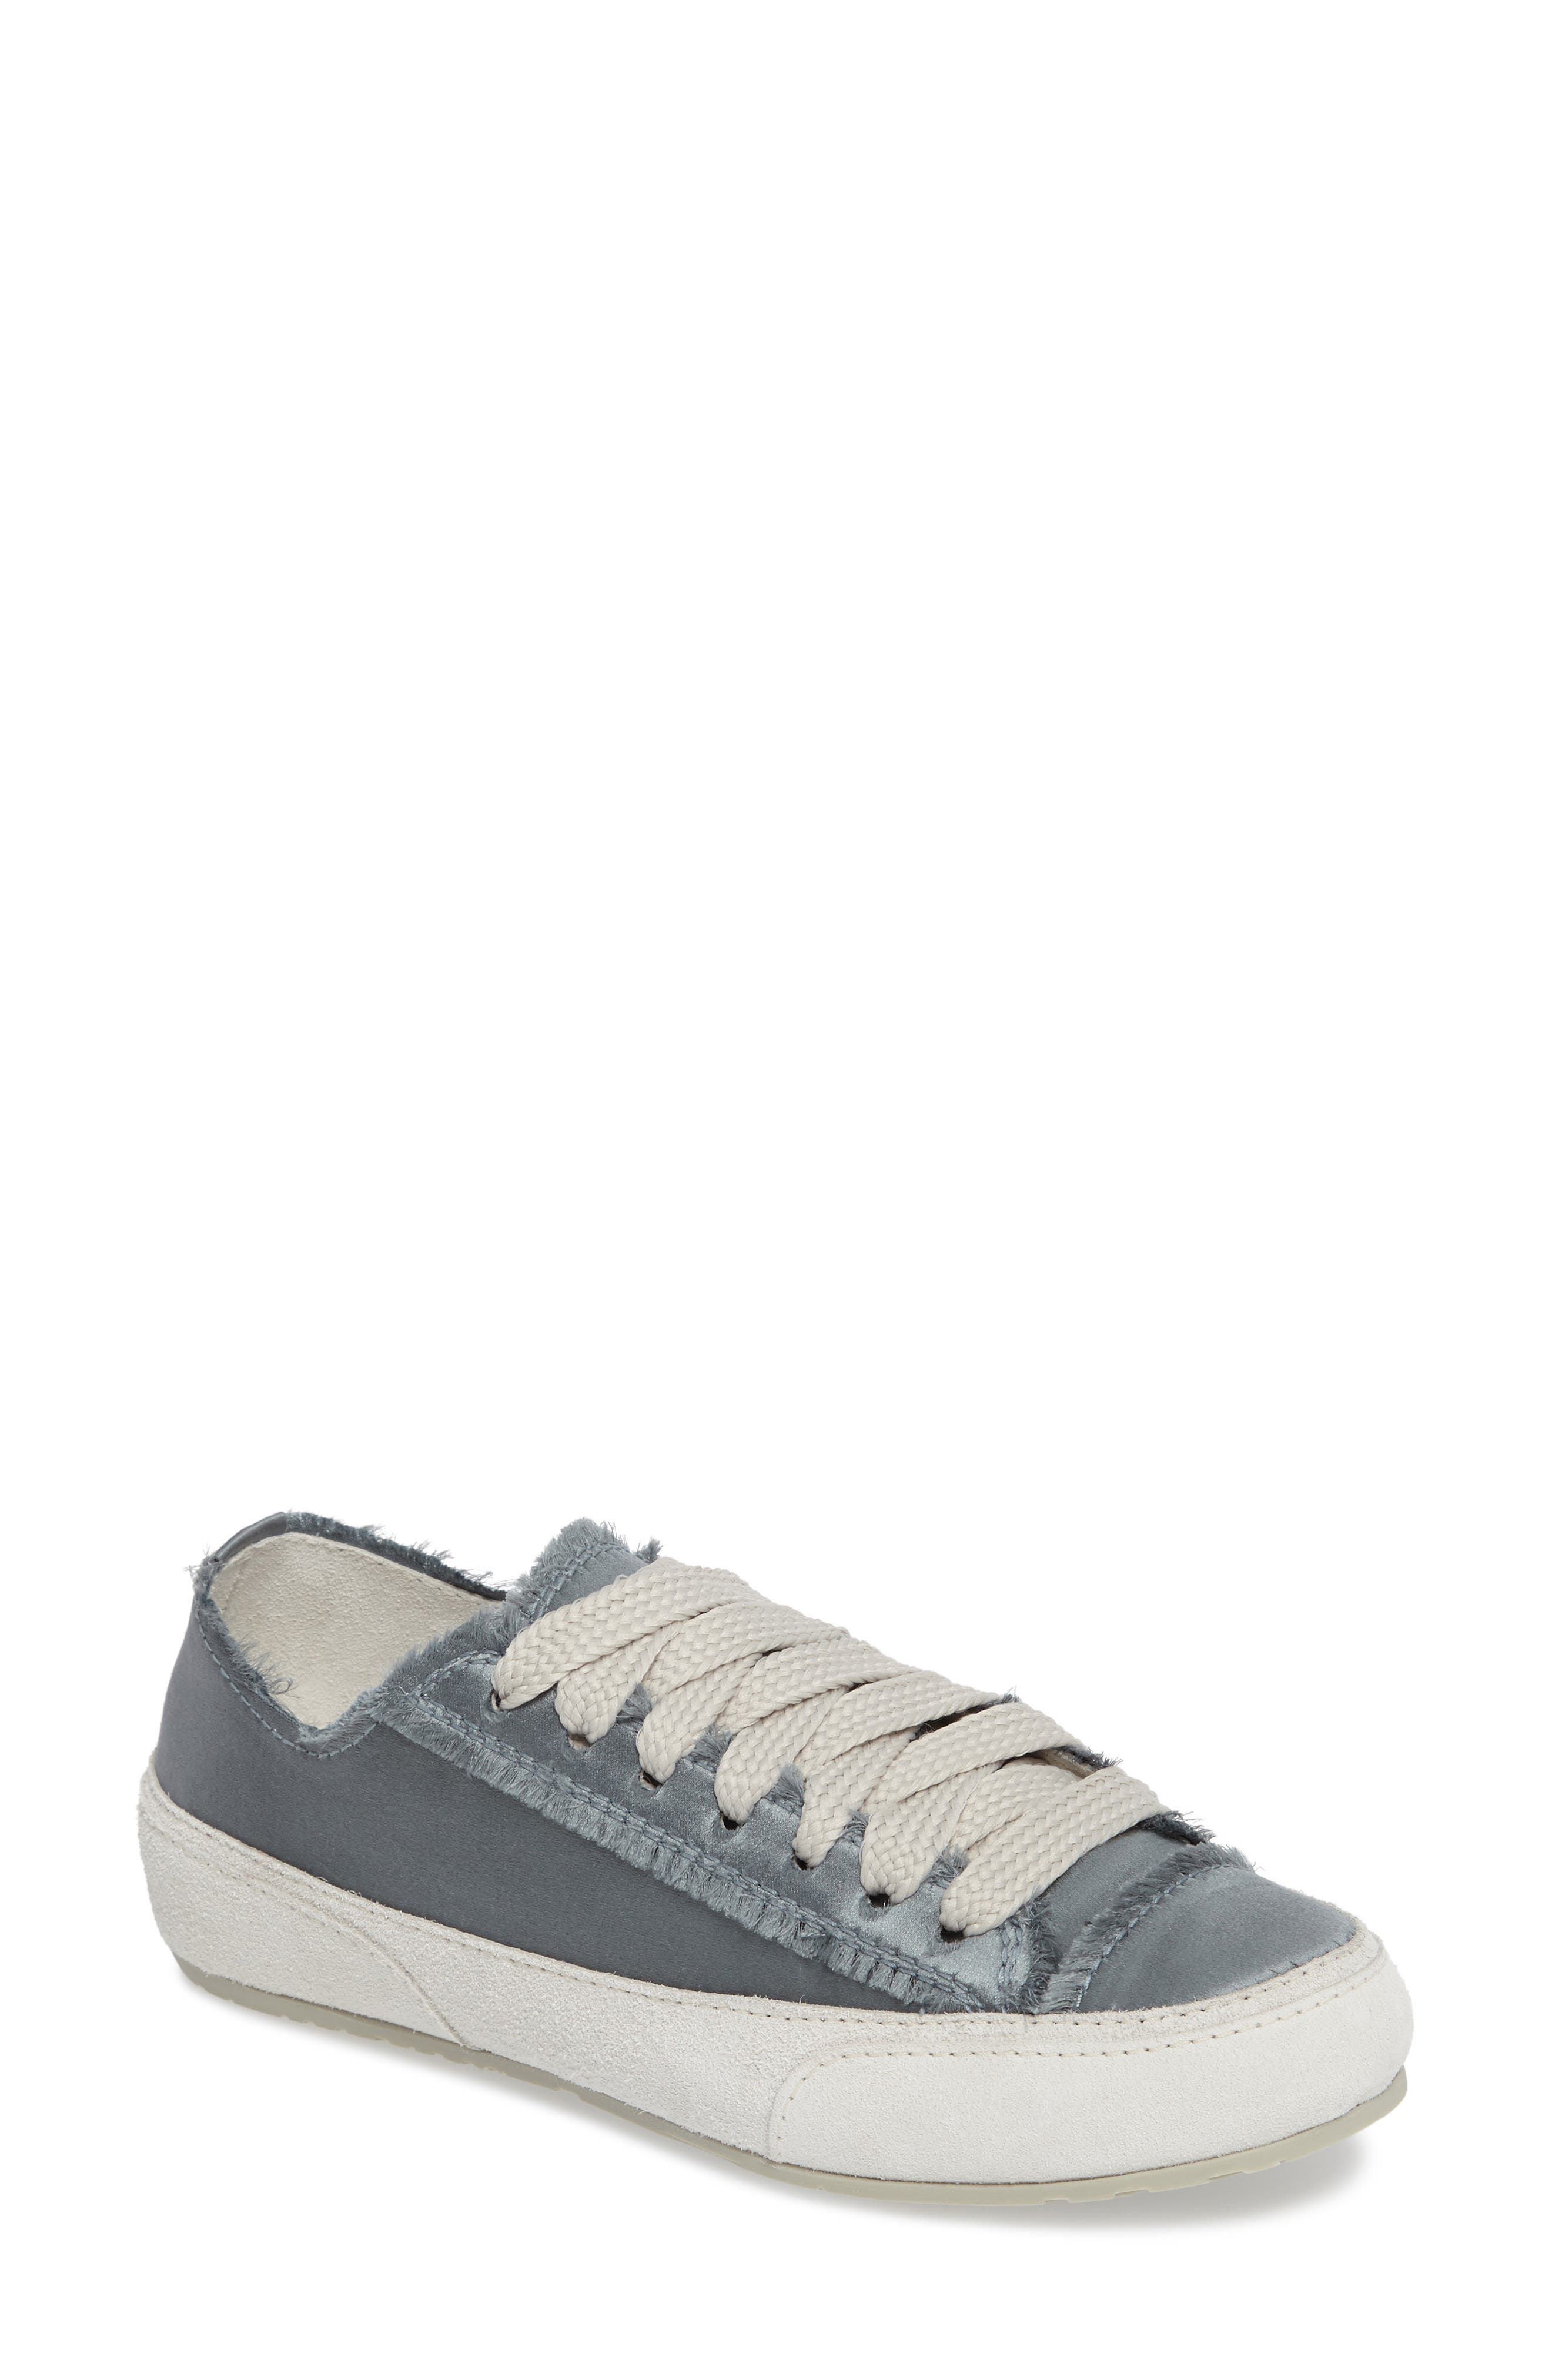 Pedro Garcia 'Parson' Satin Sneaker (Women)